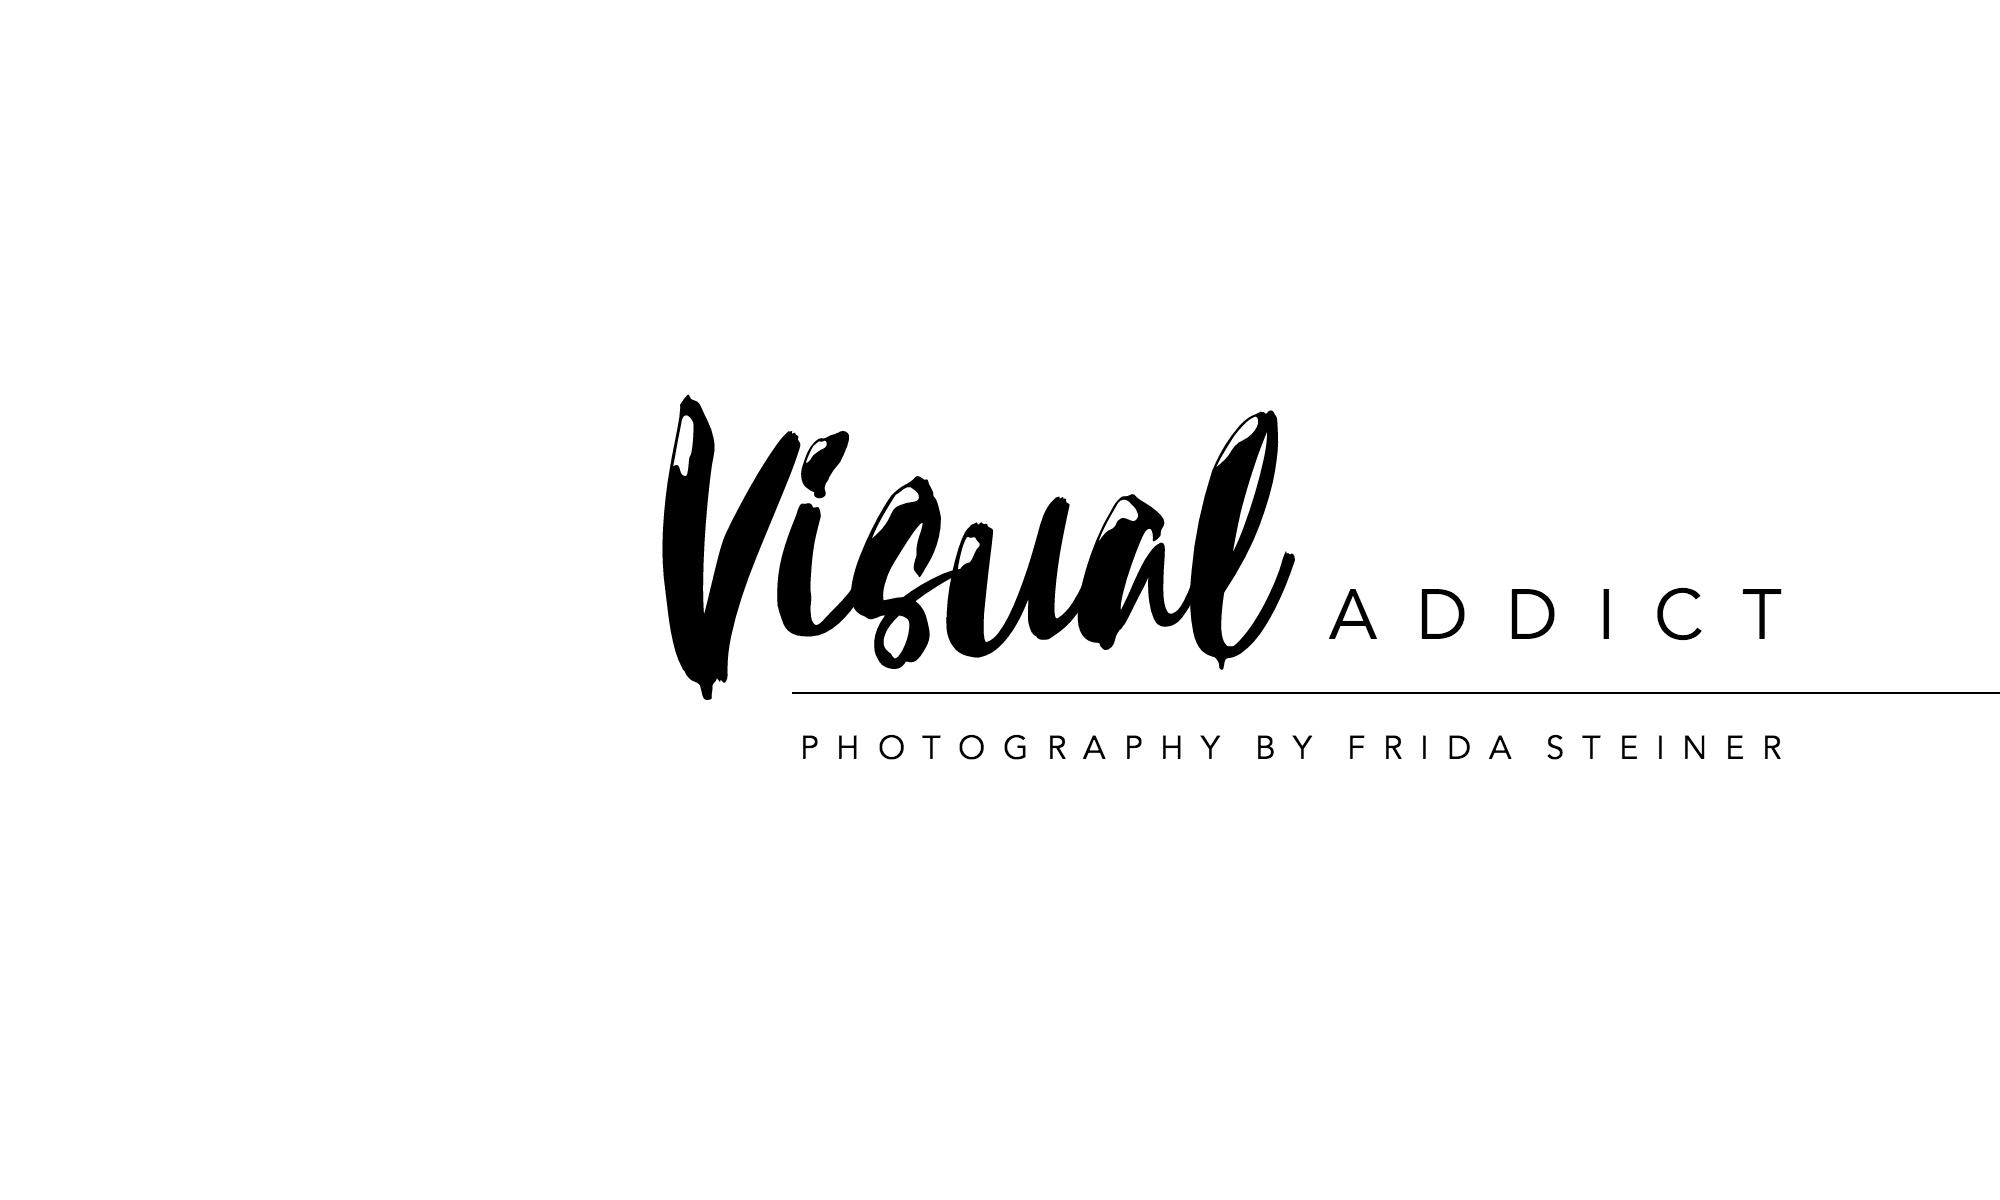 Visualaddict Photography